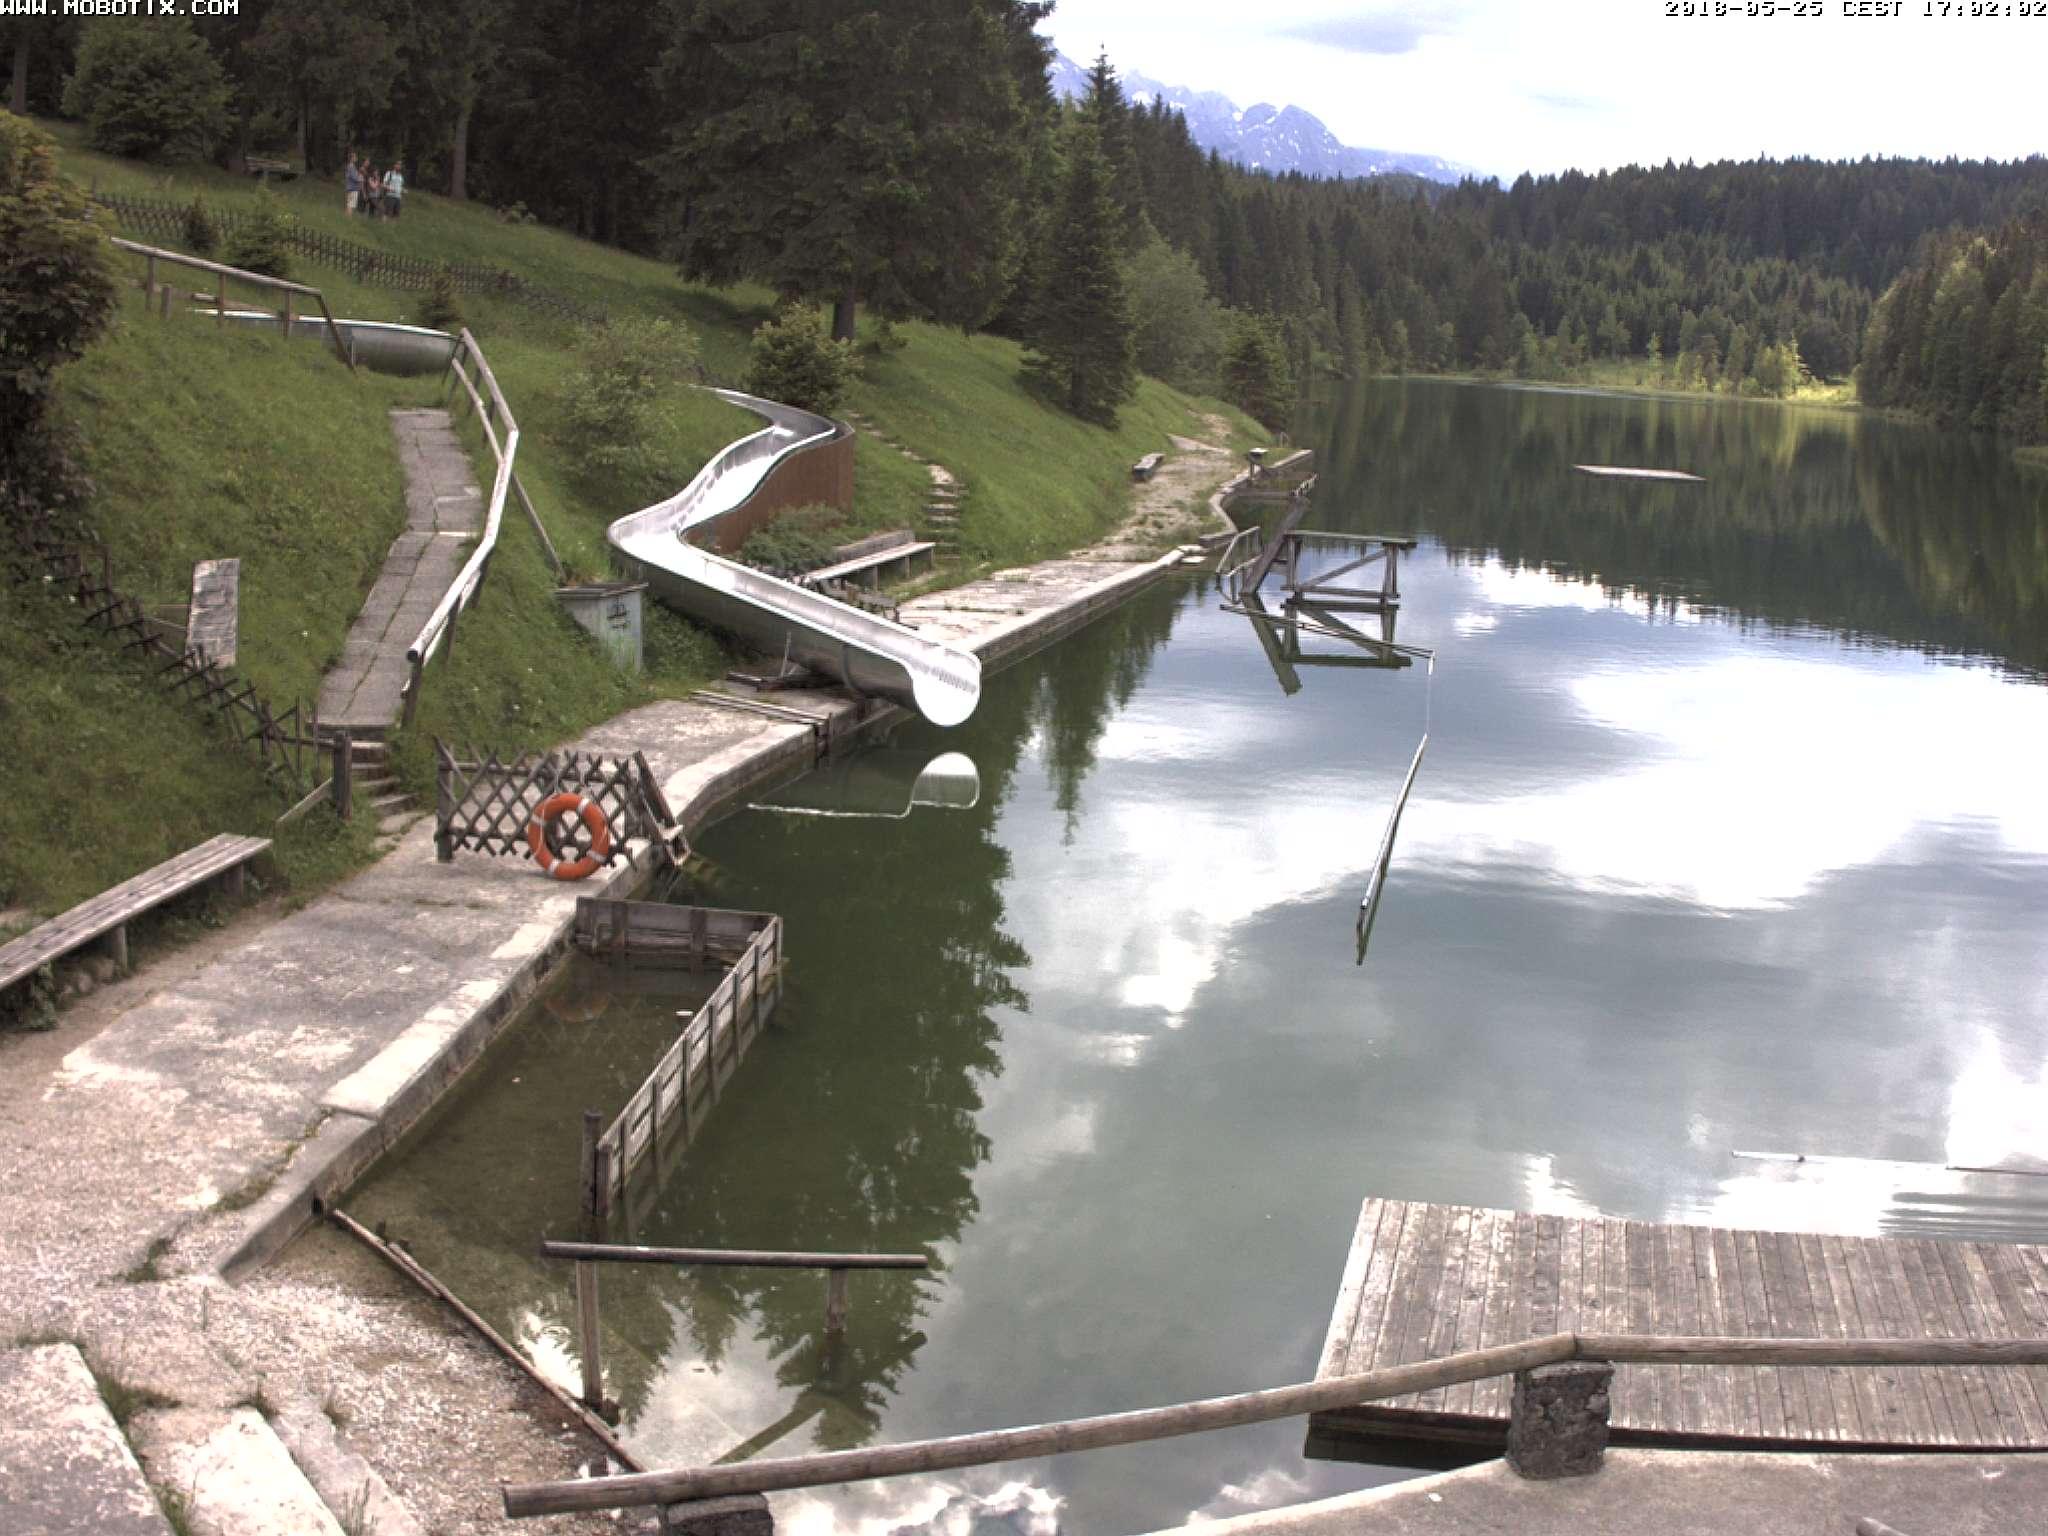 Webcam Grubsee 17 Uhr